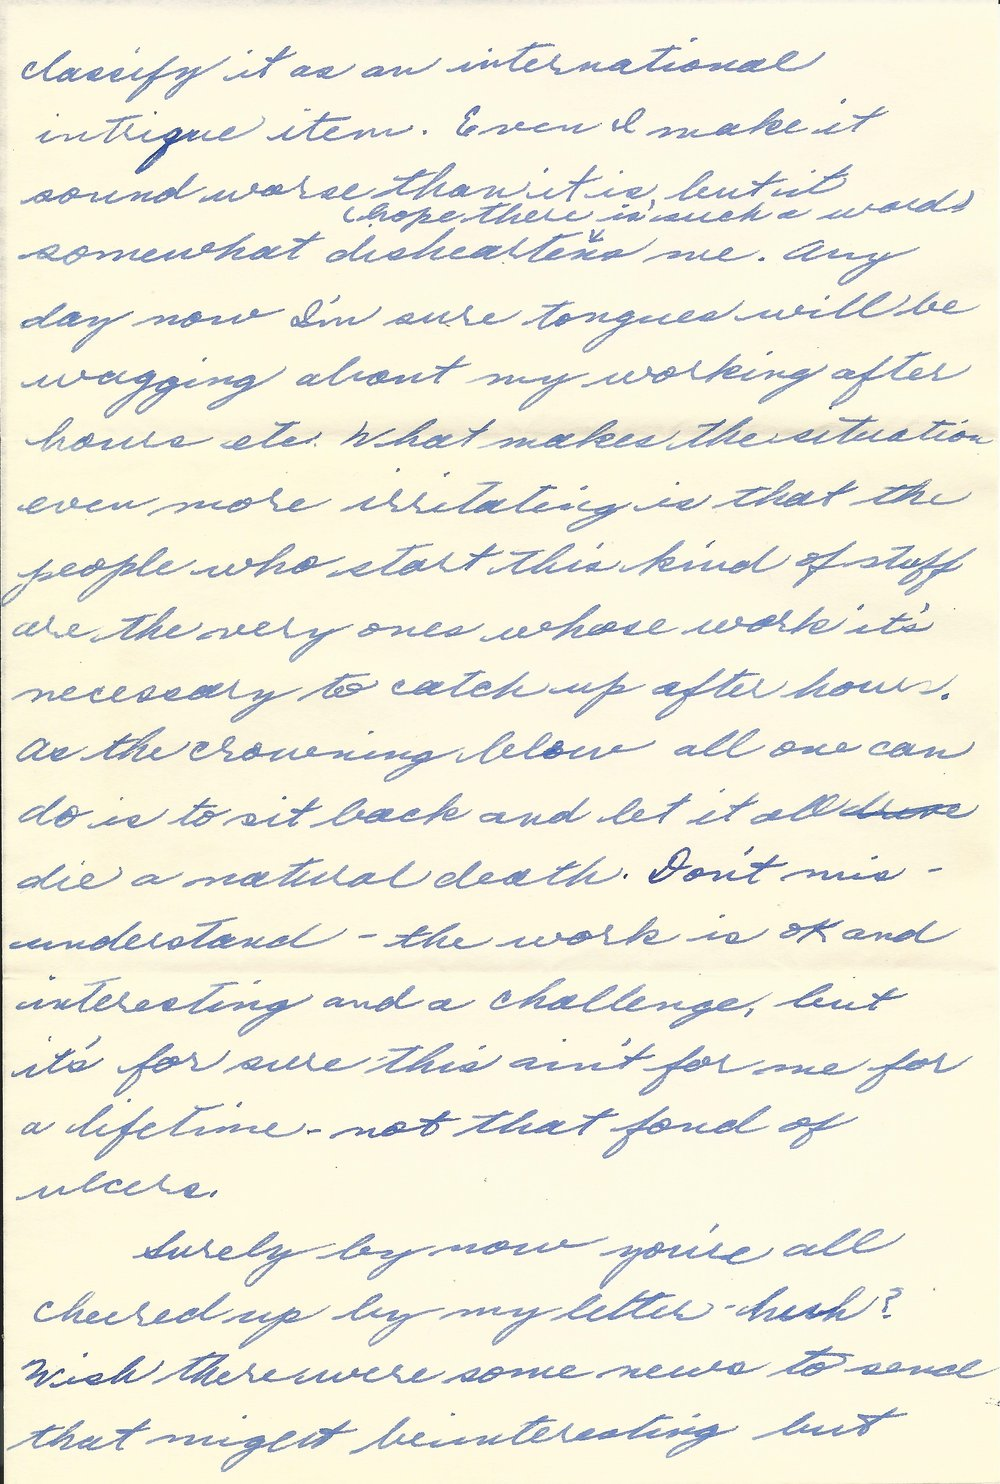 8. Jan. 16, 1953 (Oma)_Page_5.jpg